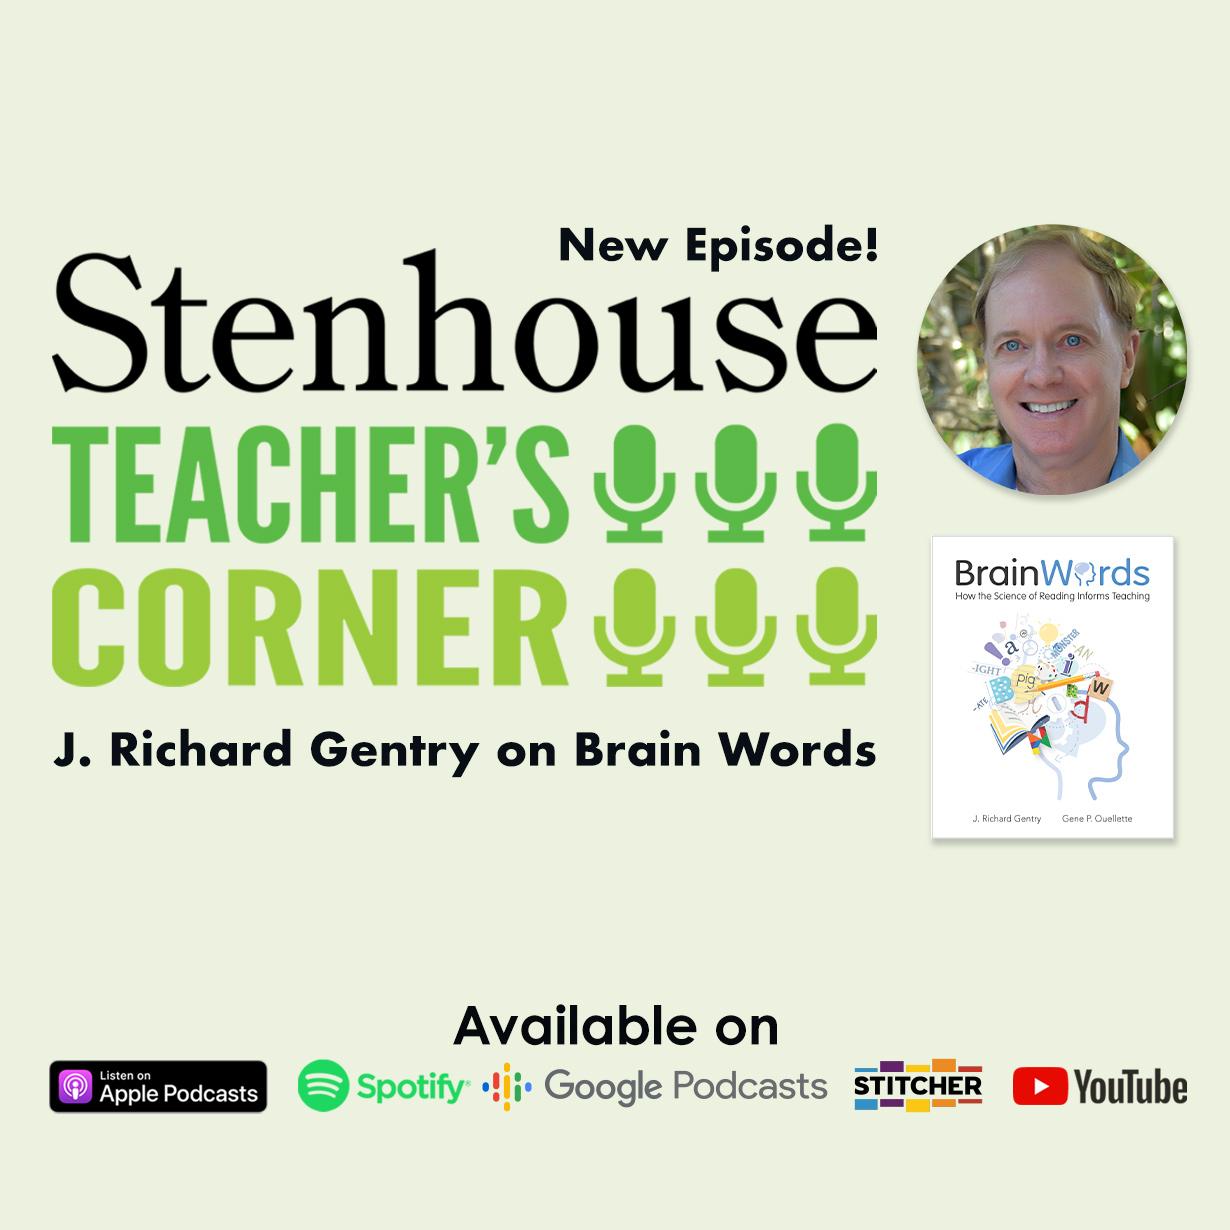 Richard Gentry on Brain Words